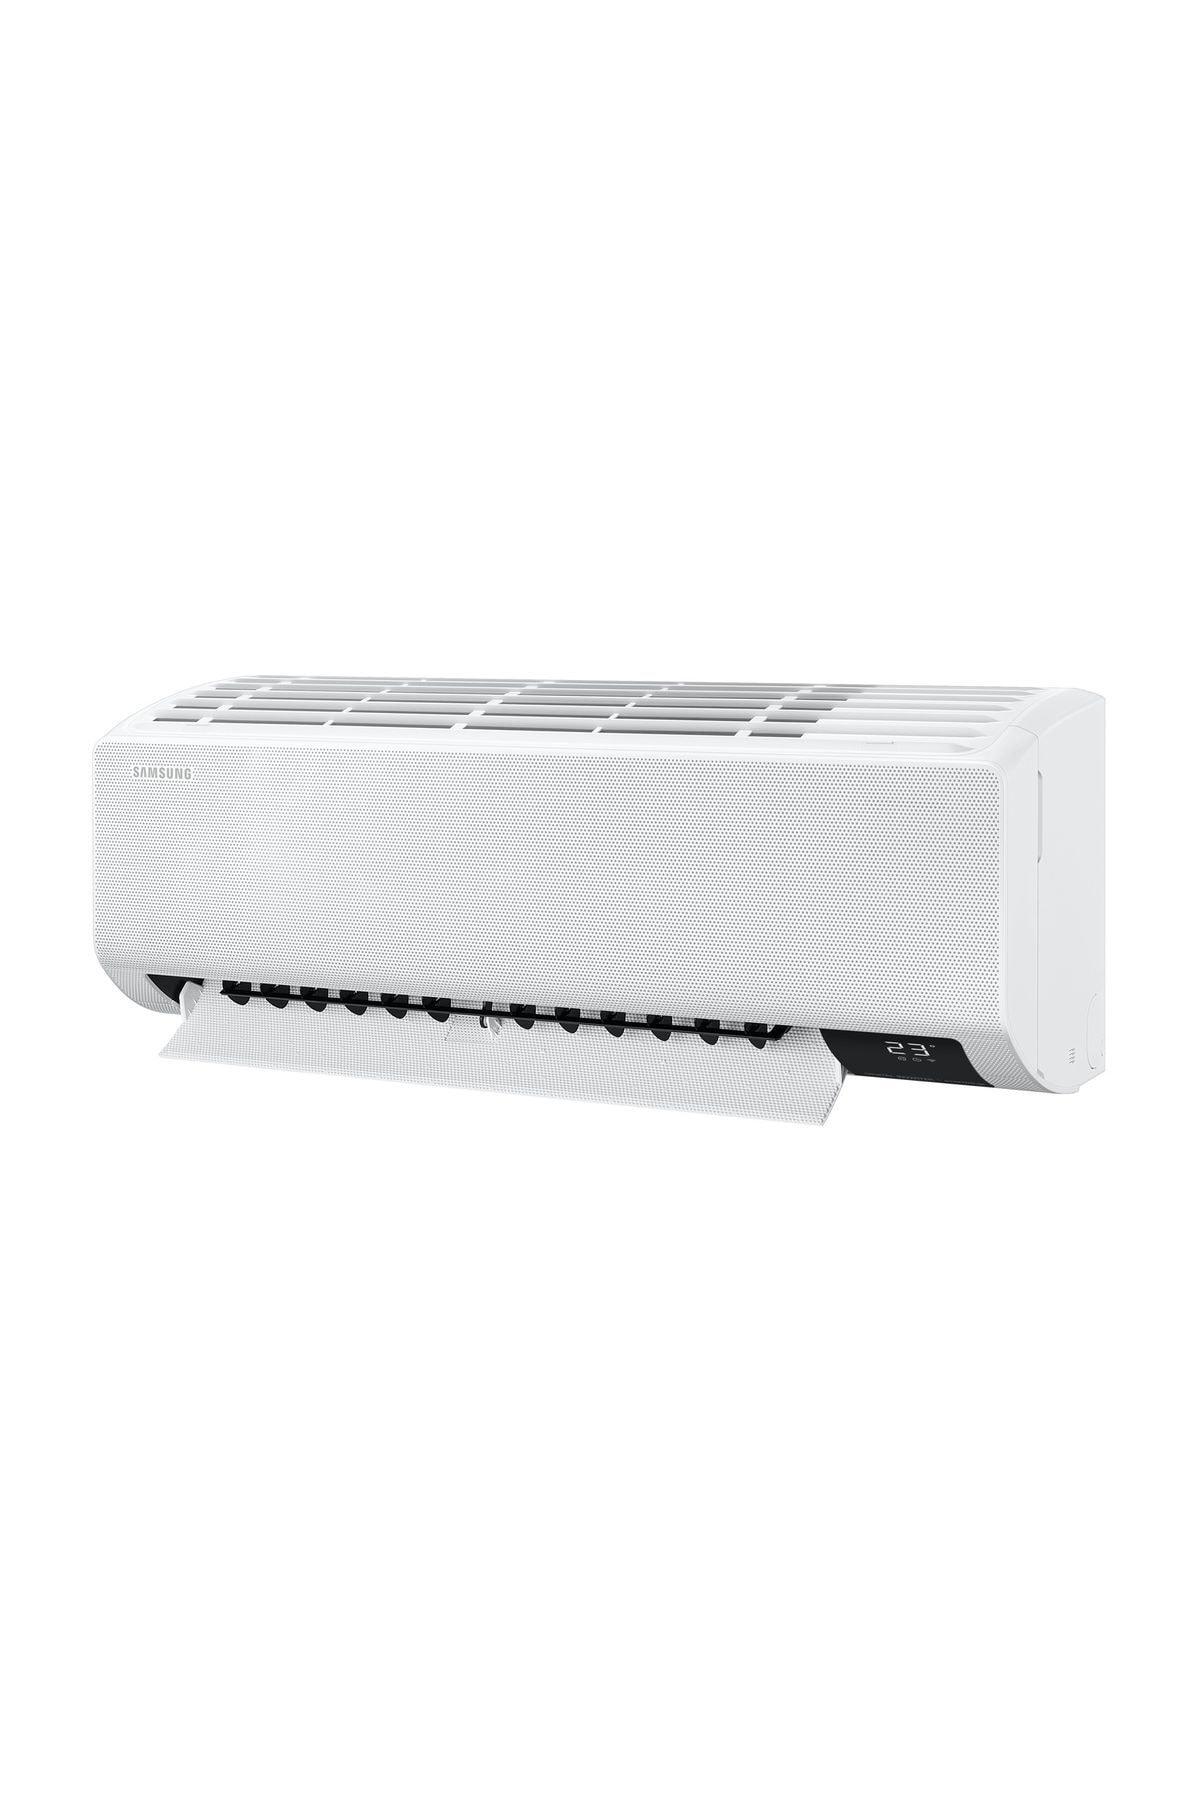 AR9500T AR09TSFCAWK/SK Wind-Free 9000 BTU Inverter Duvar Tipi Klima